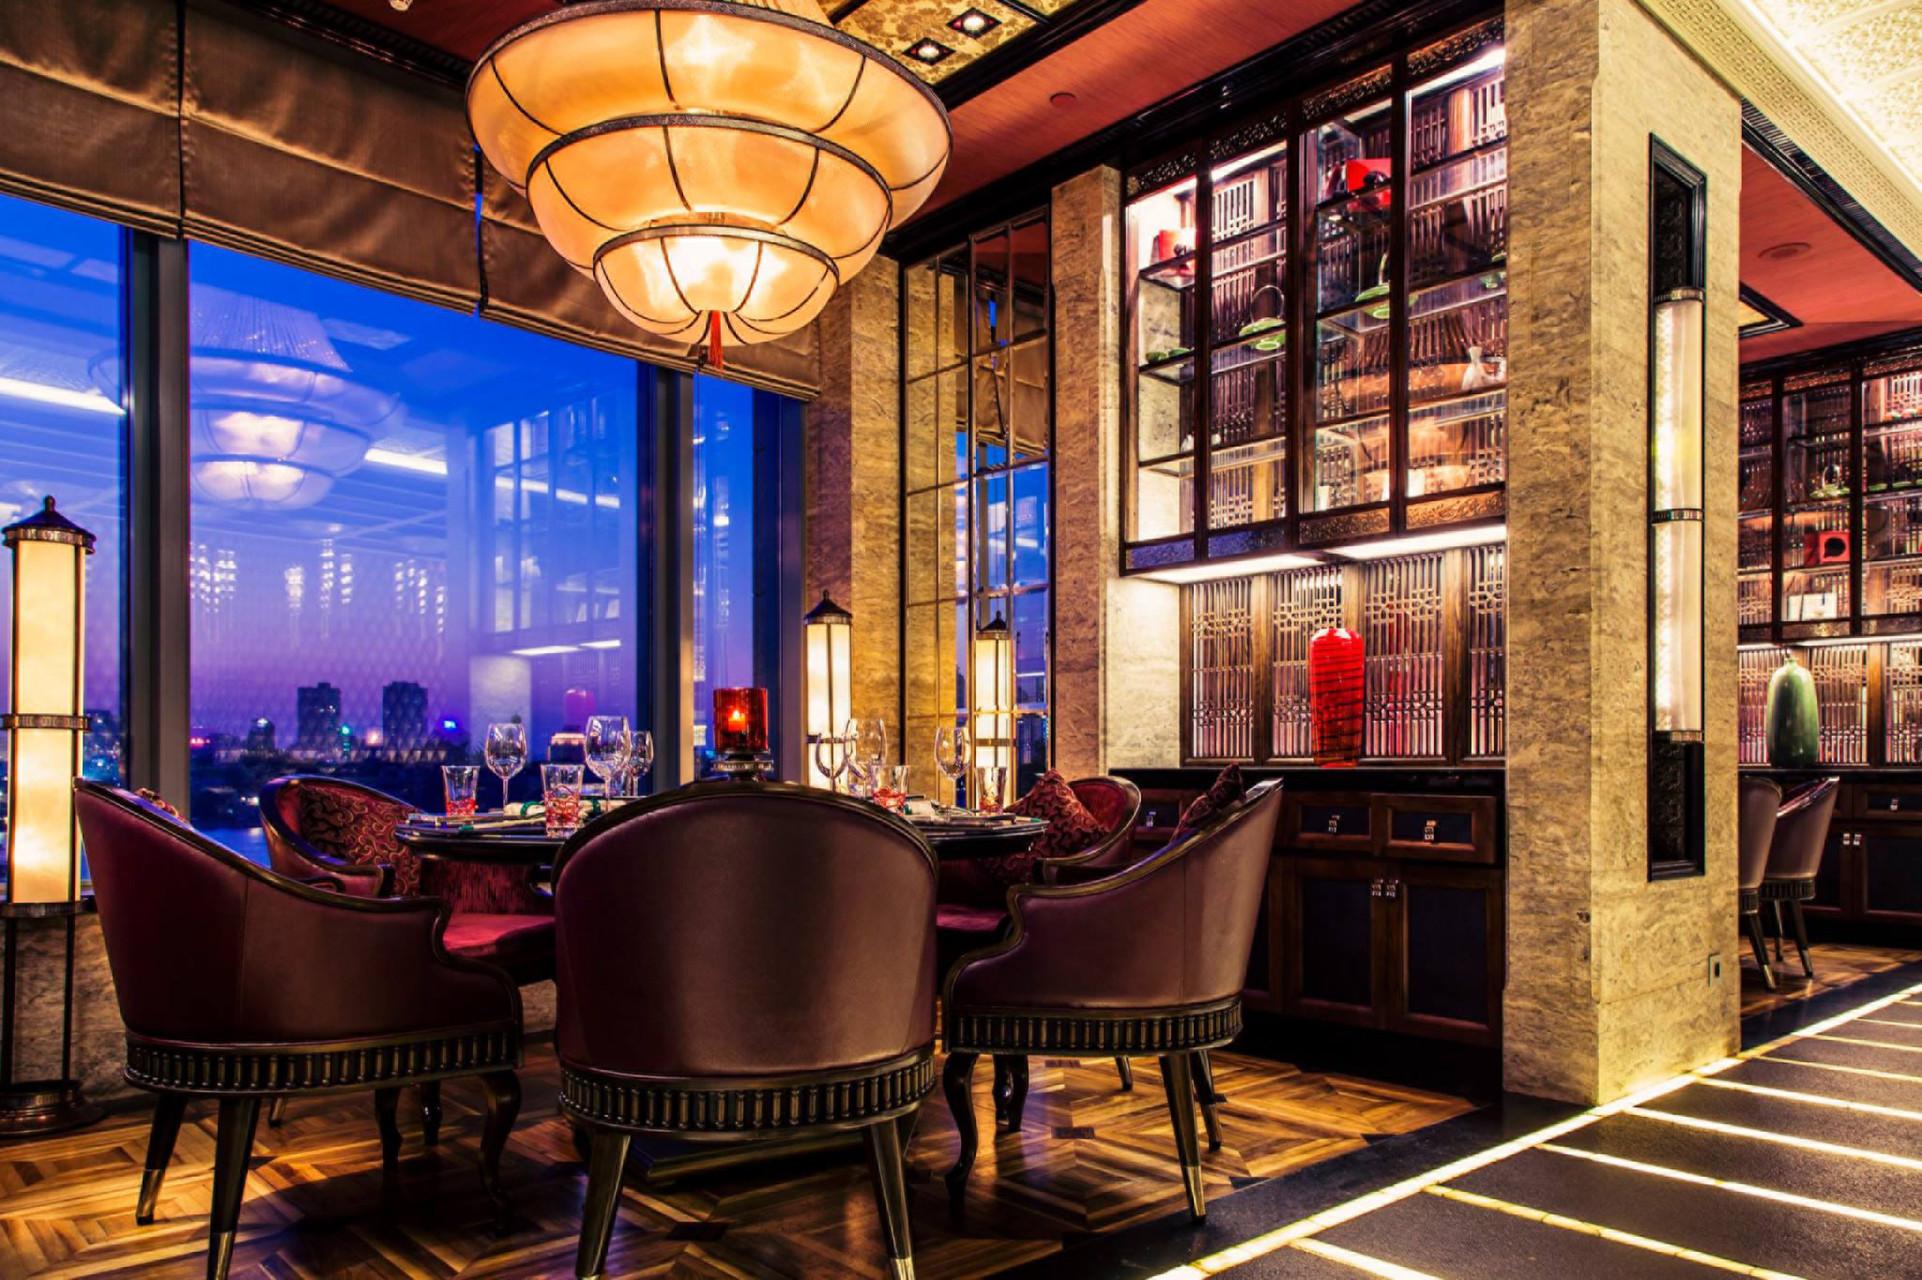 Best Chinese Restaurant In Cairo Egypt